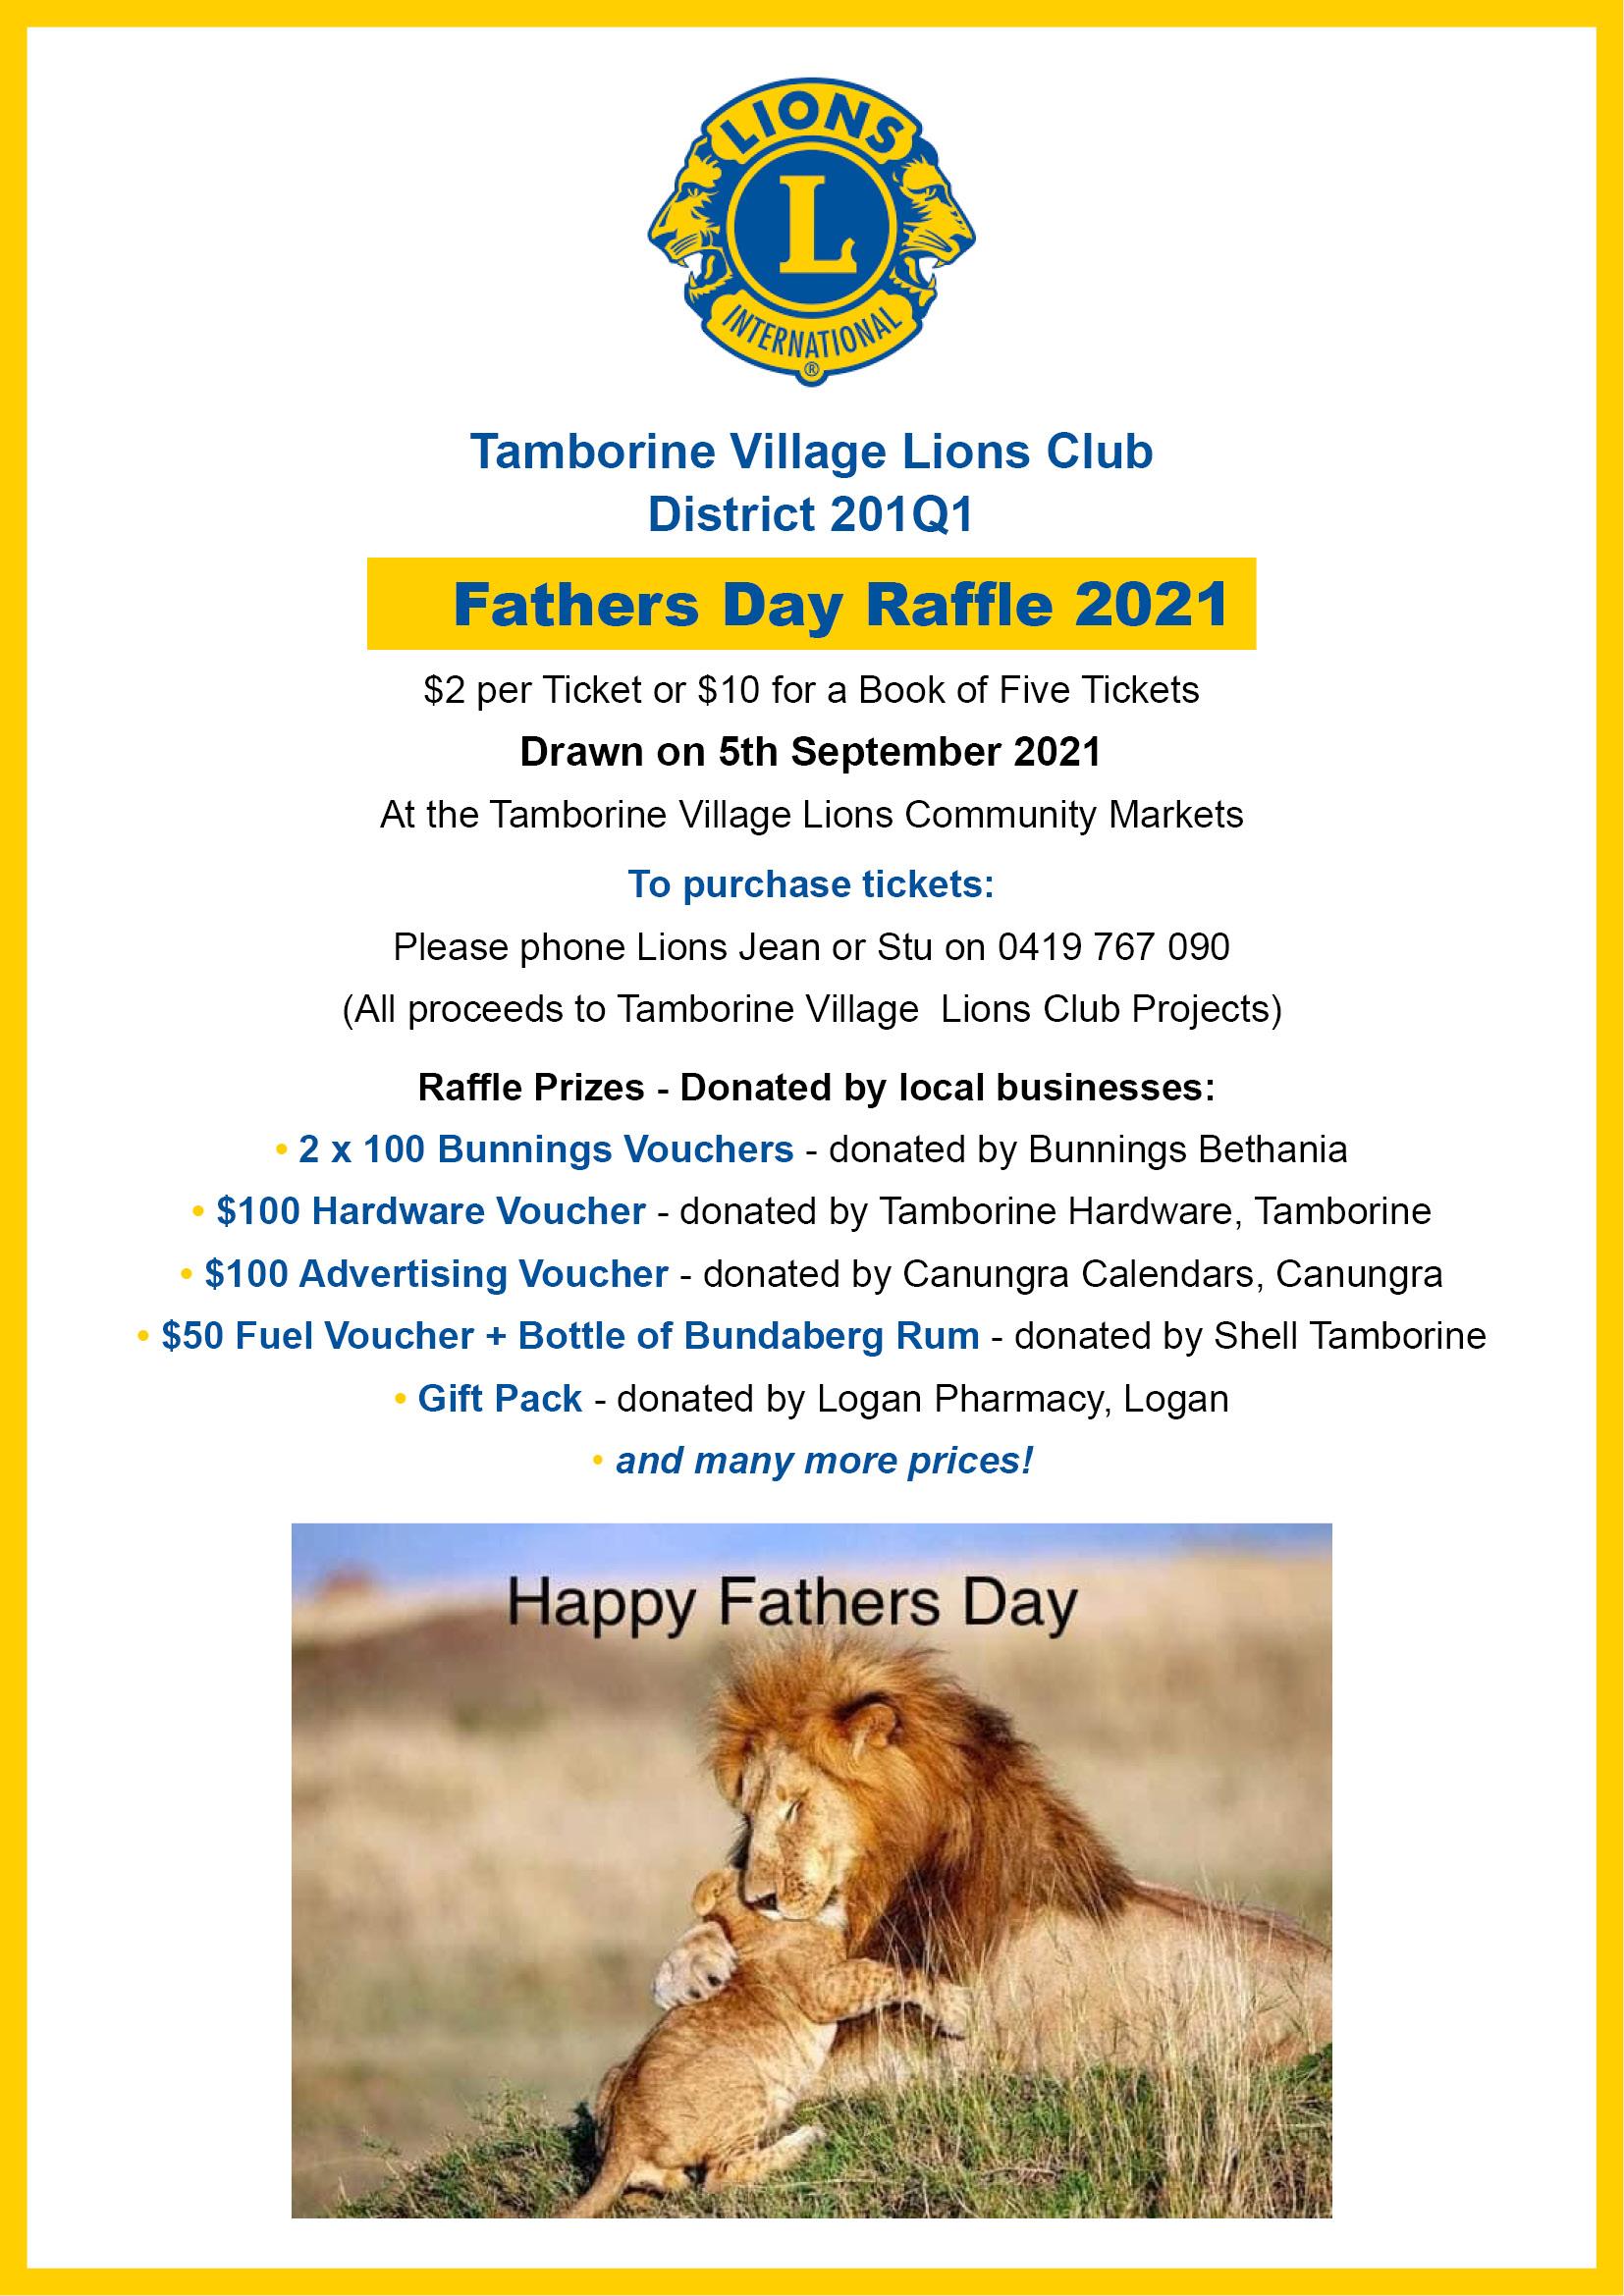 Tamborine Village Lions Fathers Day Raffle